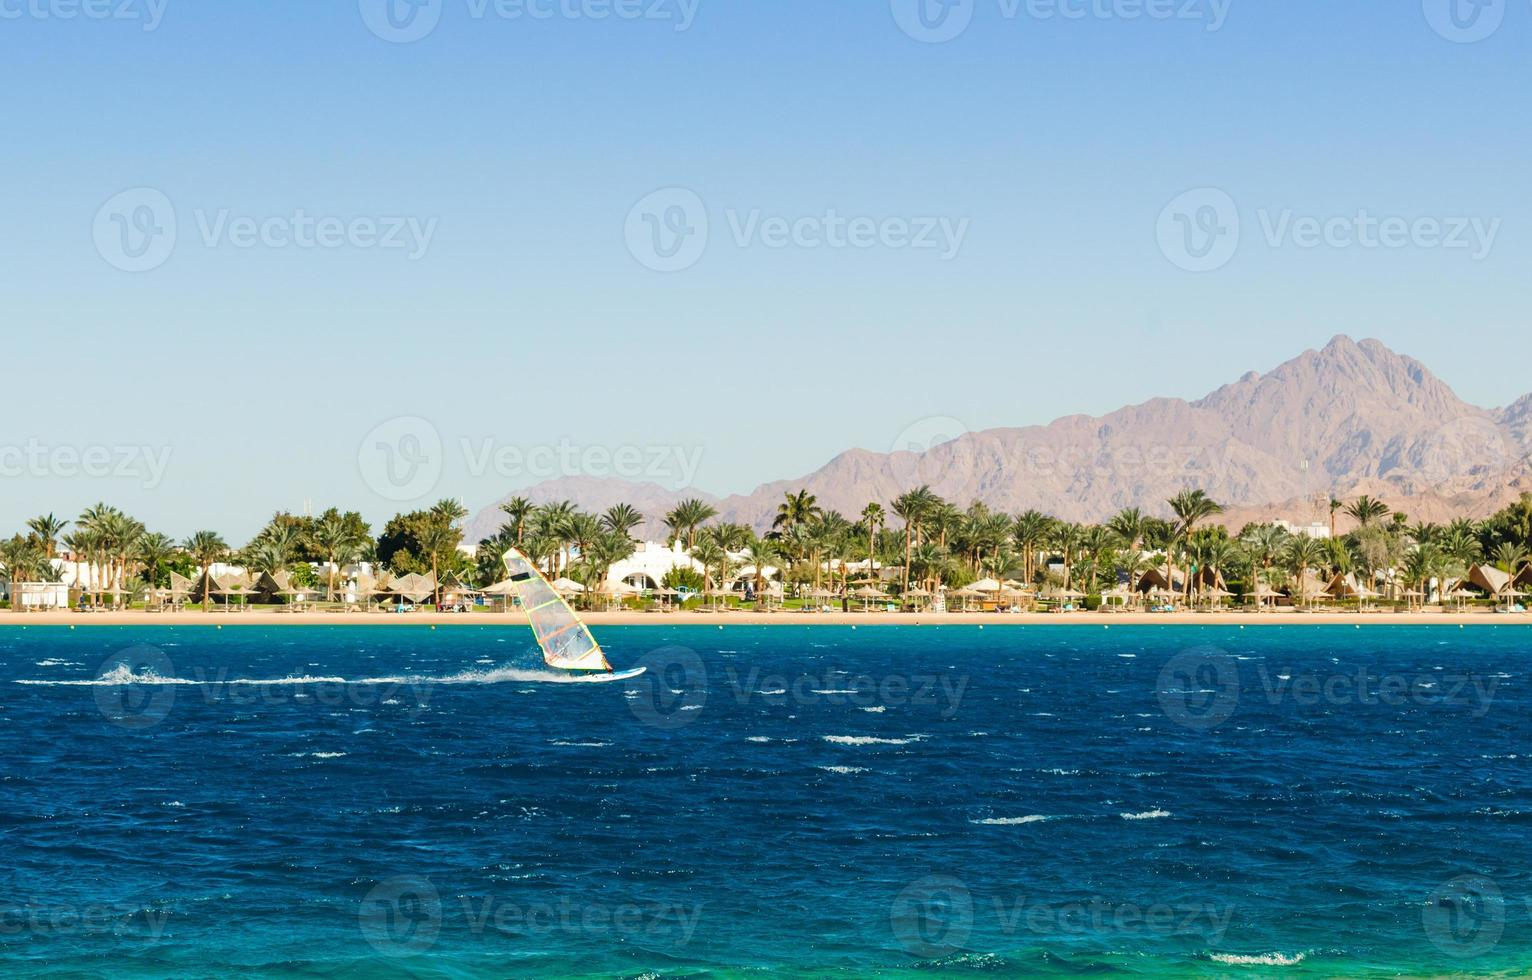 vindsurfare på stranden foto